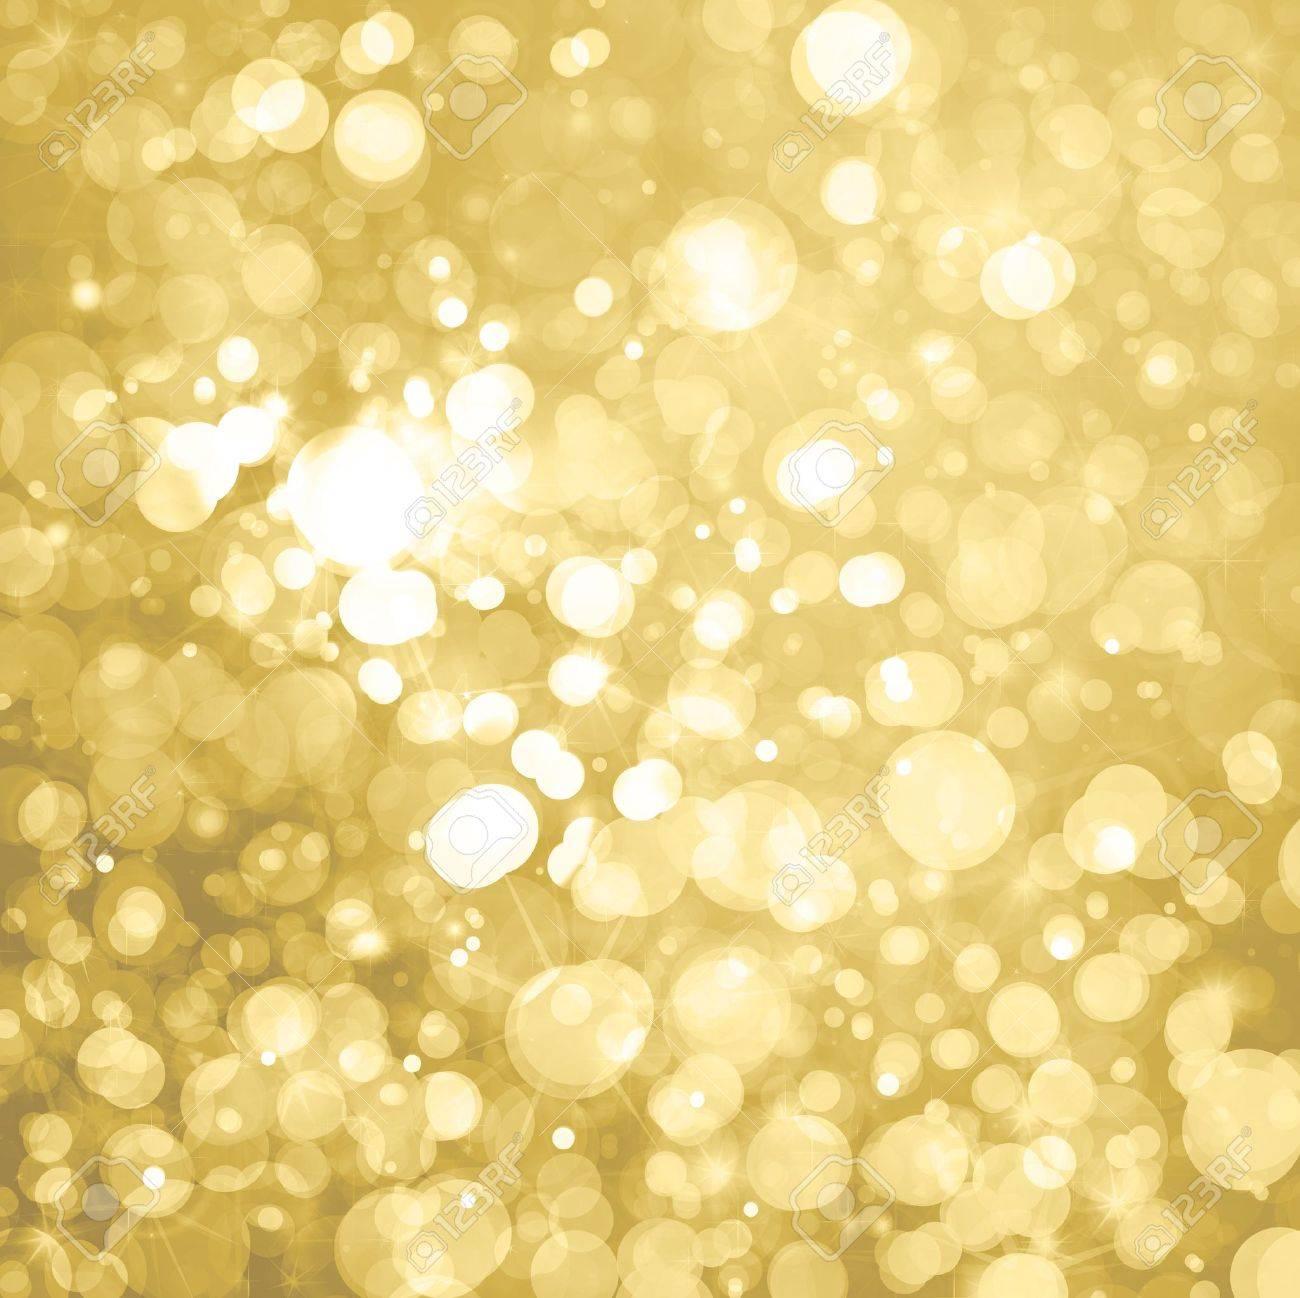 lights on golden background Stock Photo - 15773836